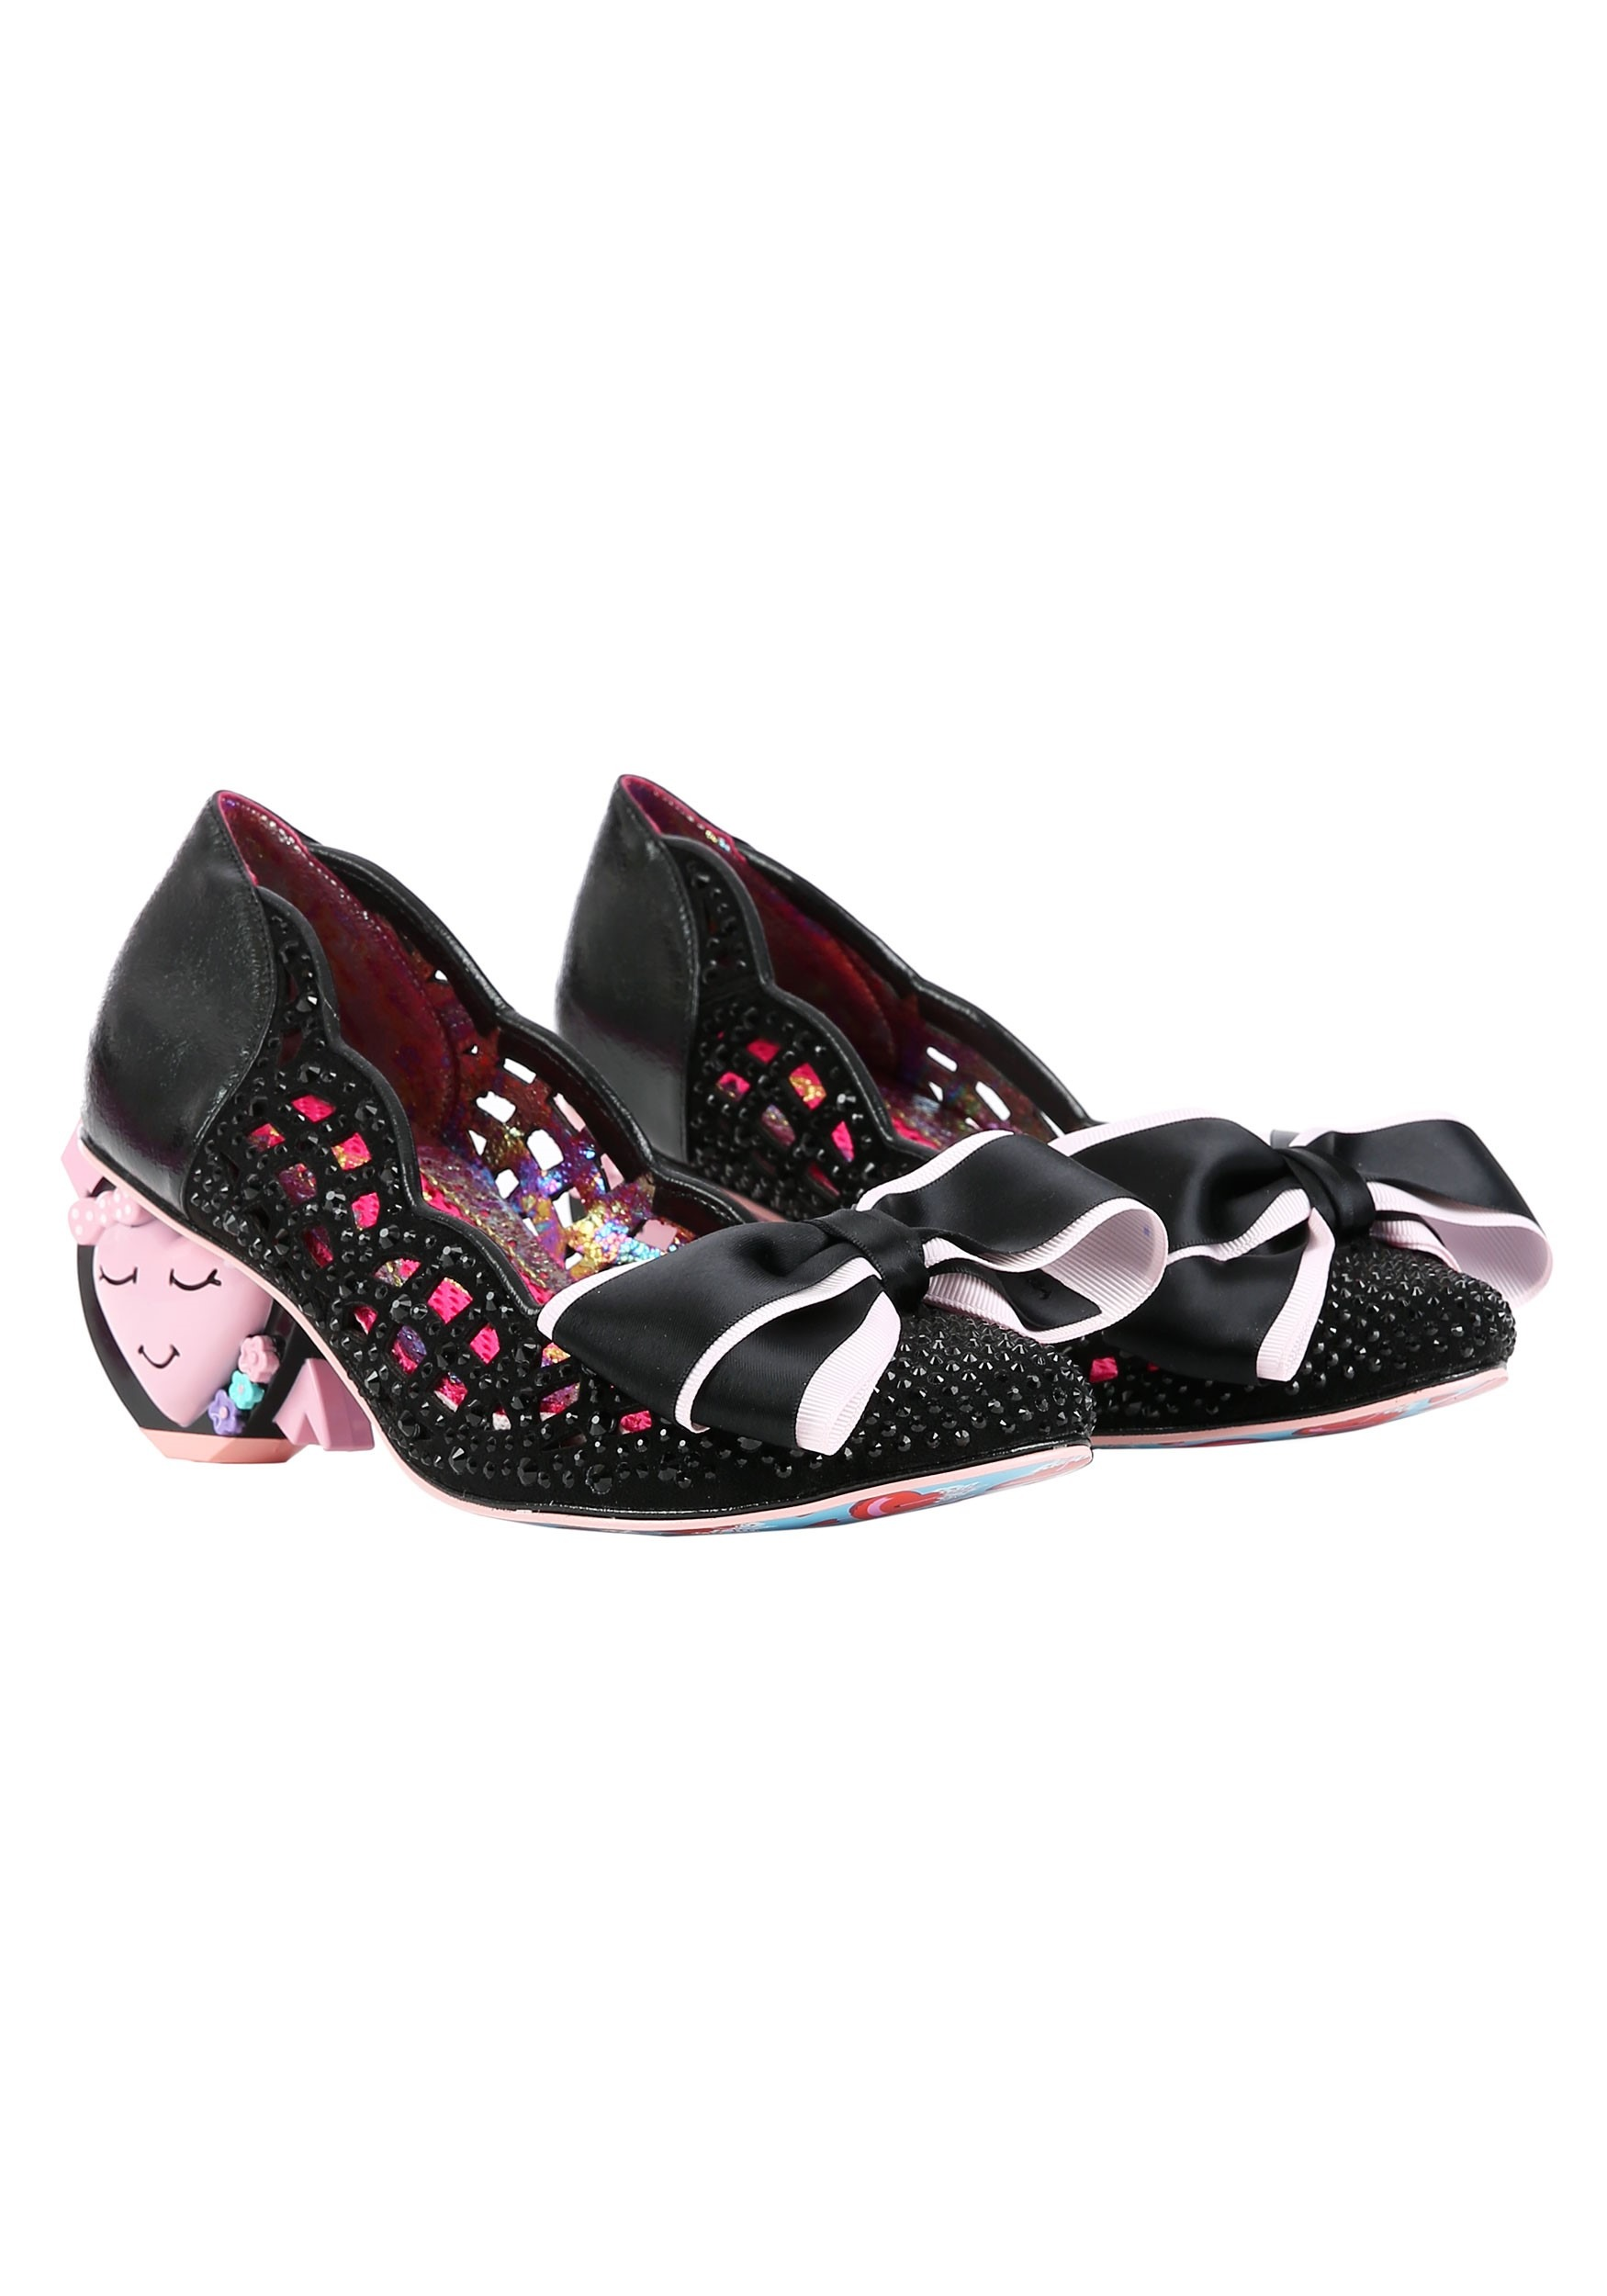 irregular choice sequin shoes